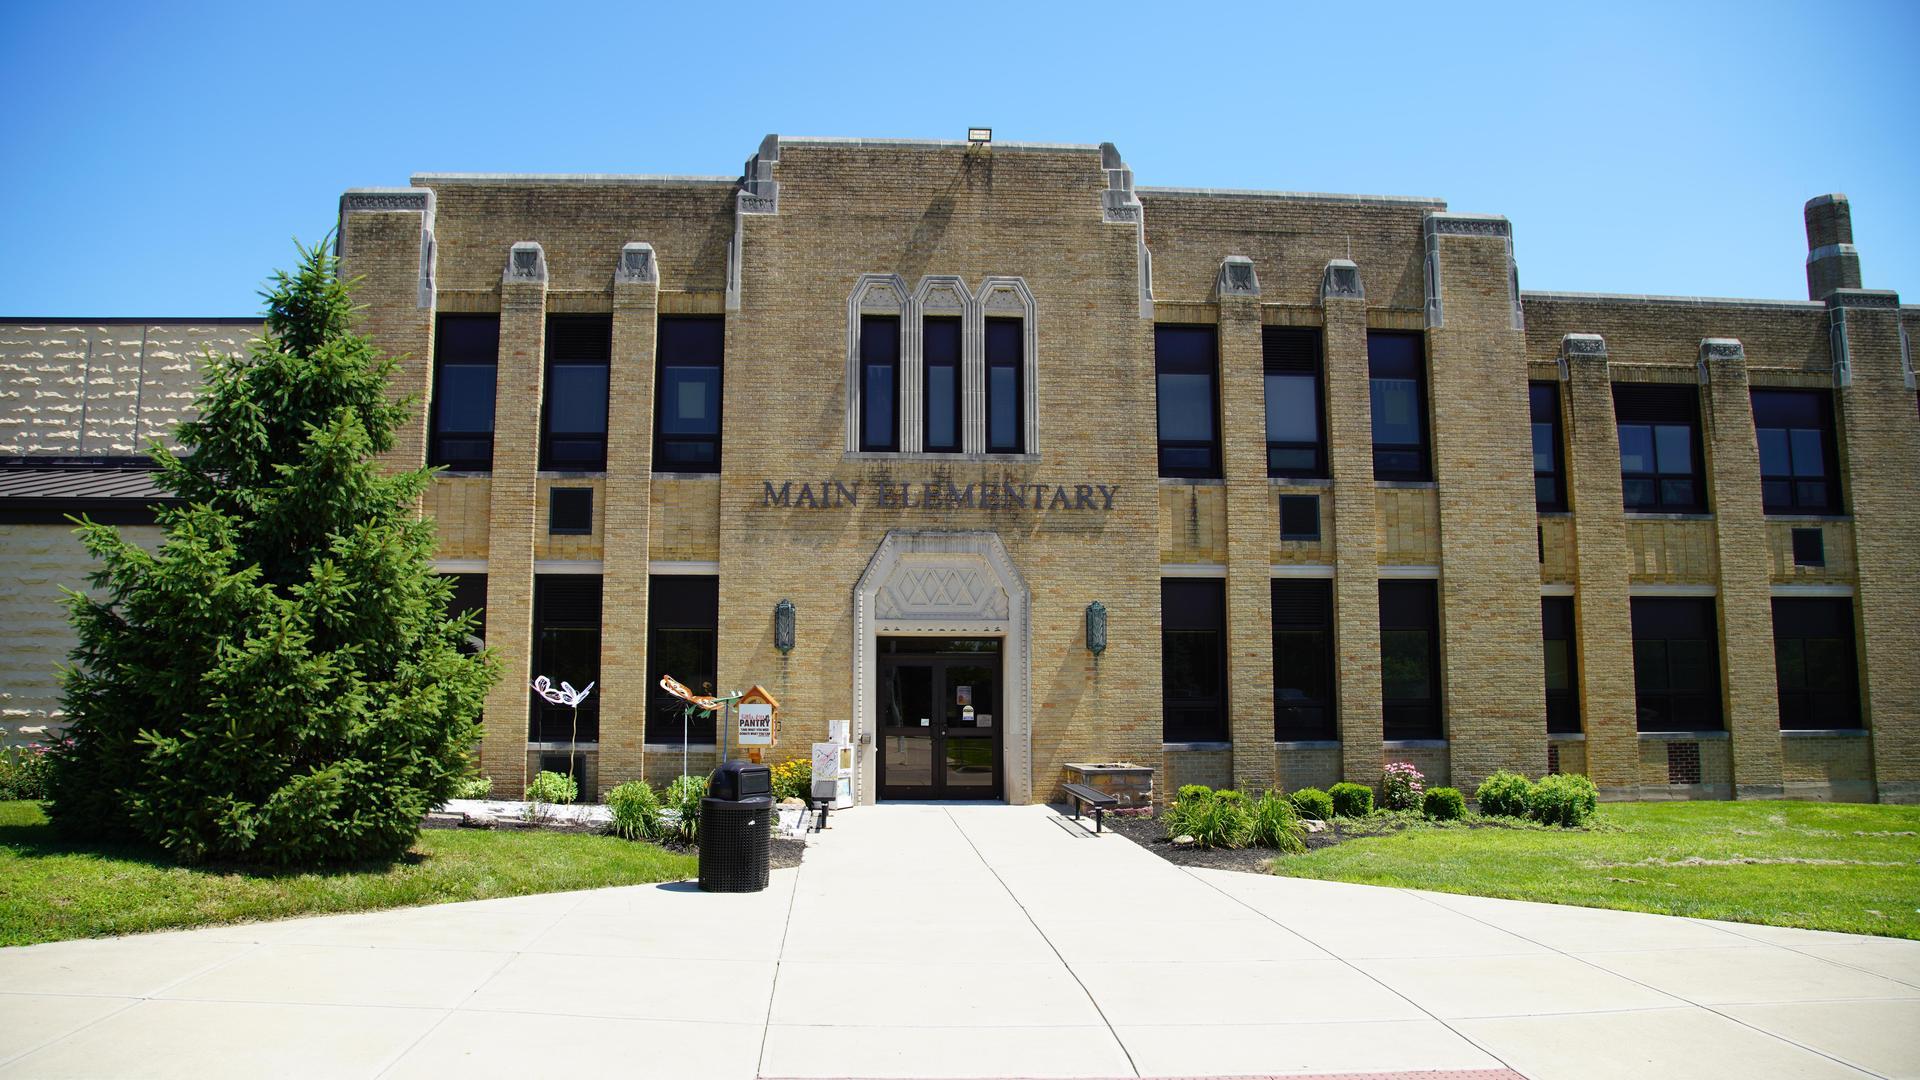 Main Elementary School